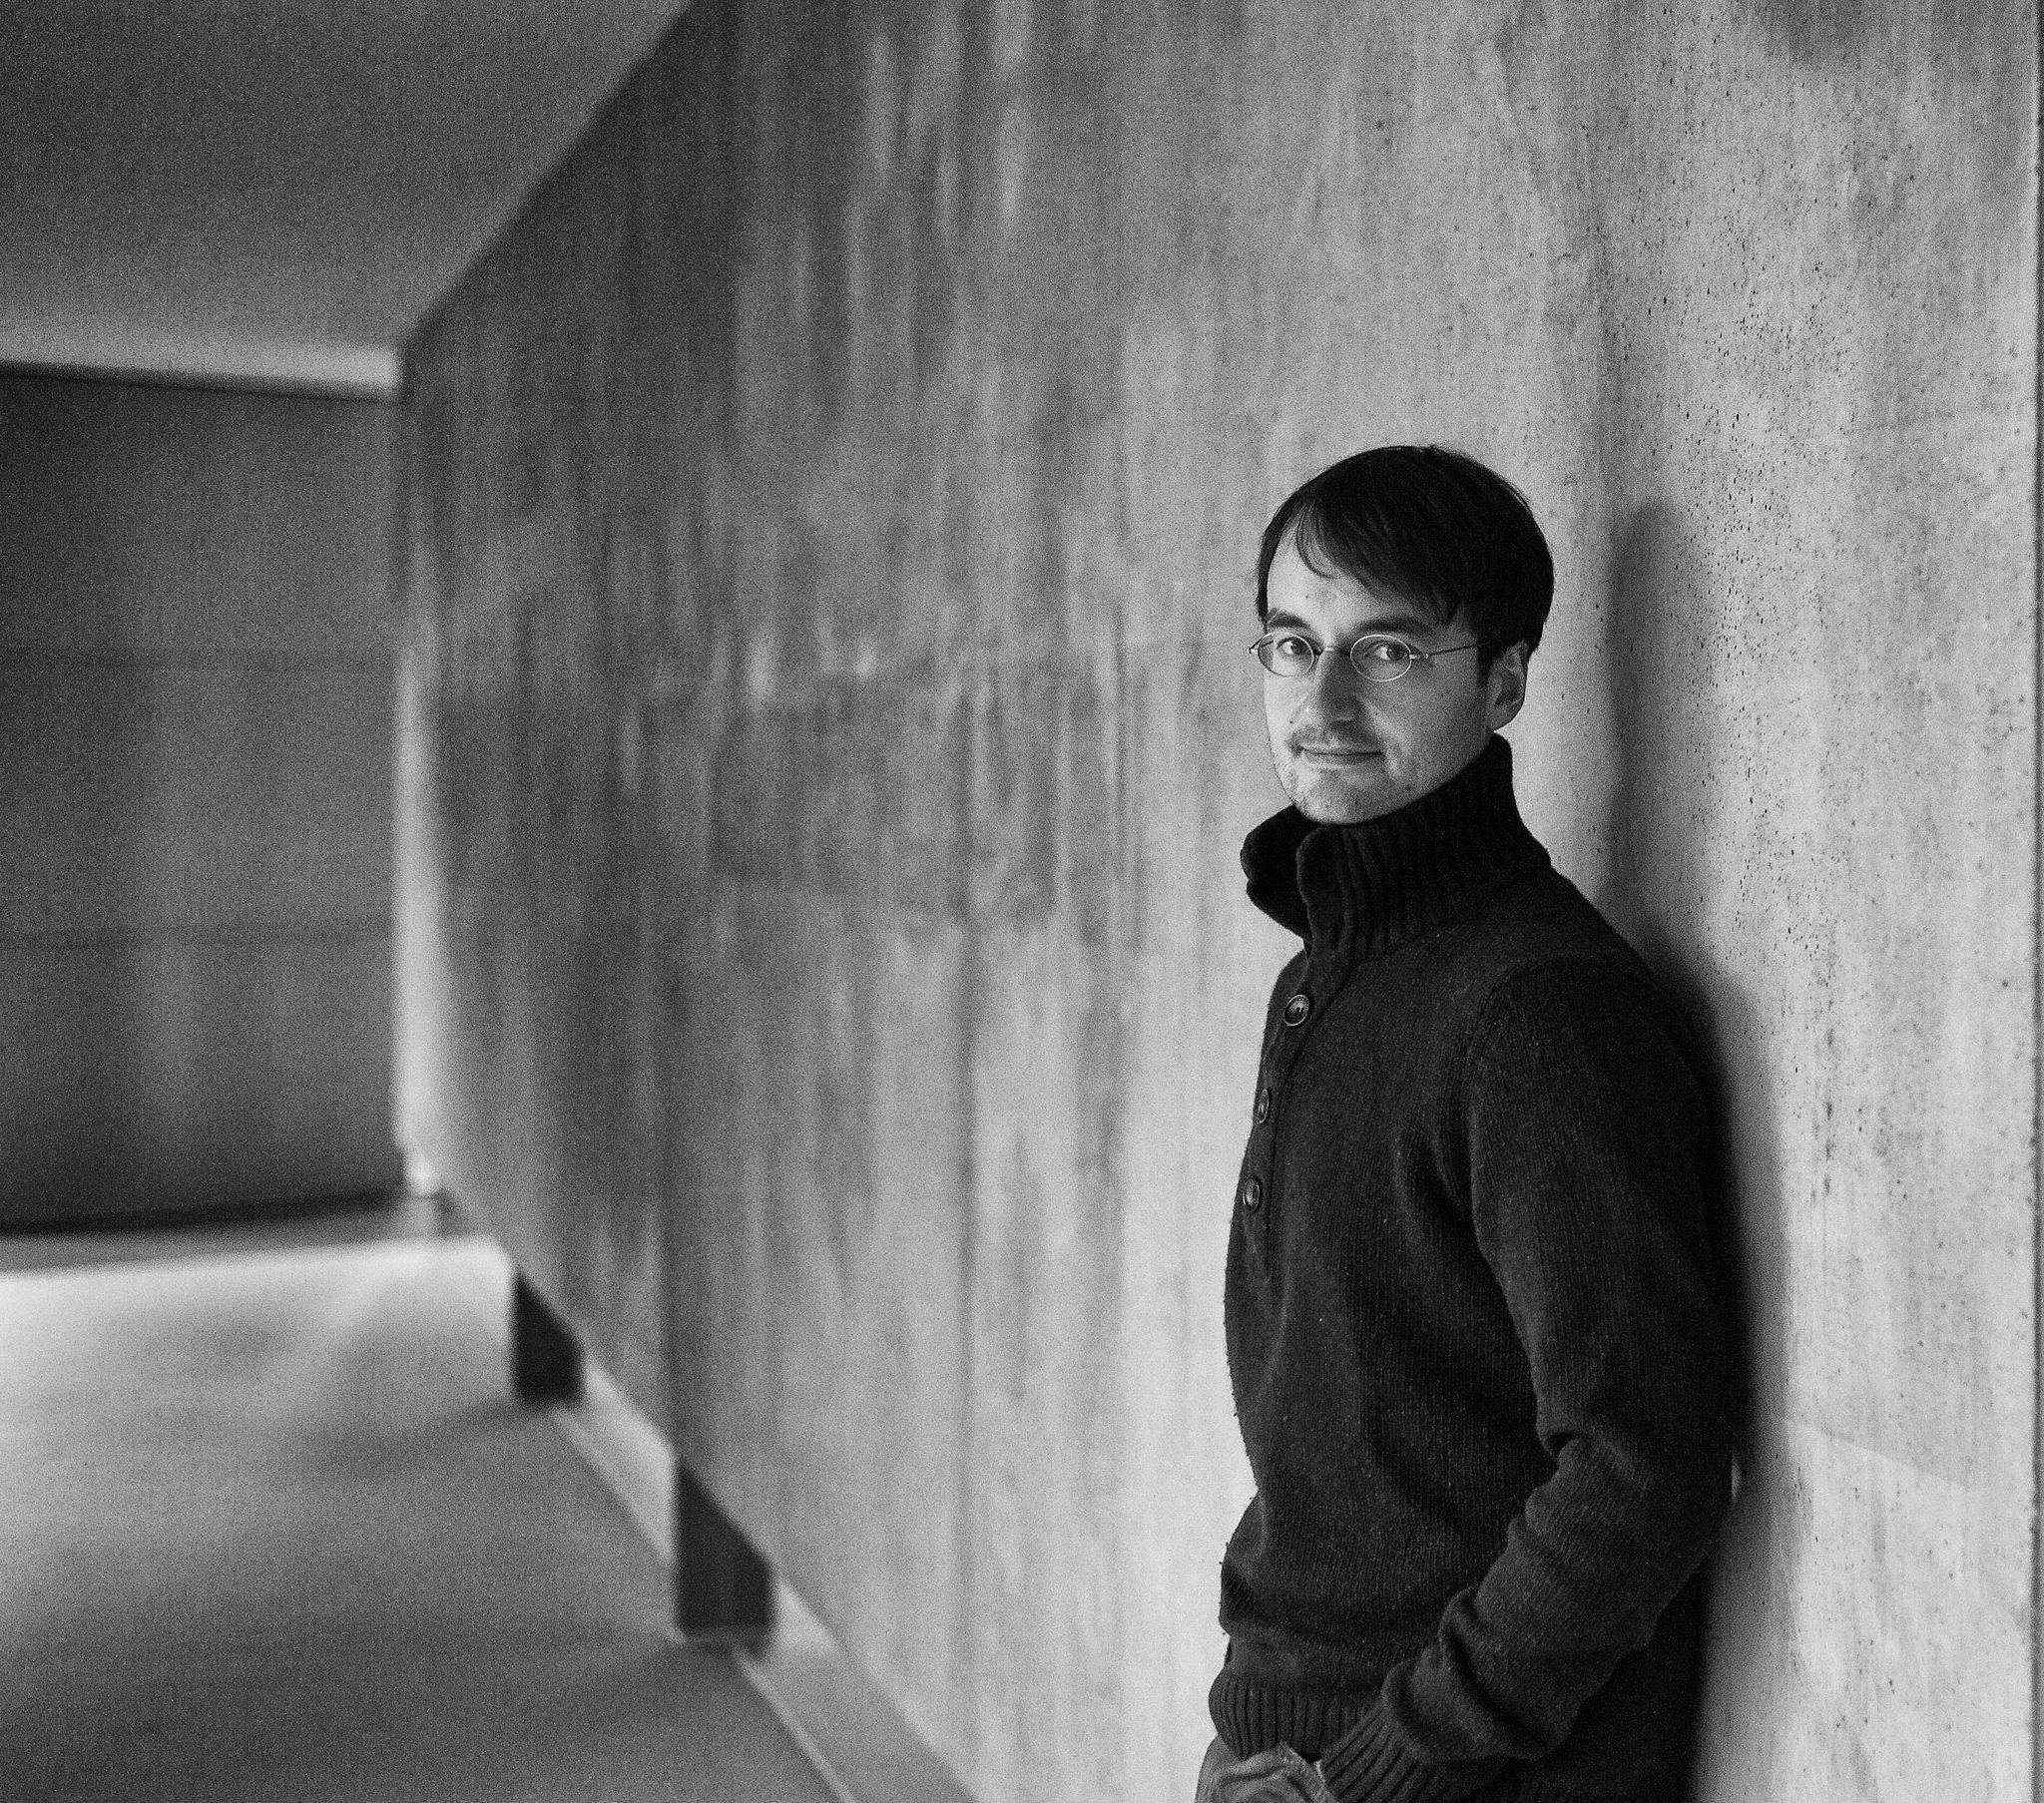 jonathan-boehm-_-schriftsteller-_-leipzi-_-foto-_-sven-mersiowski